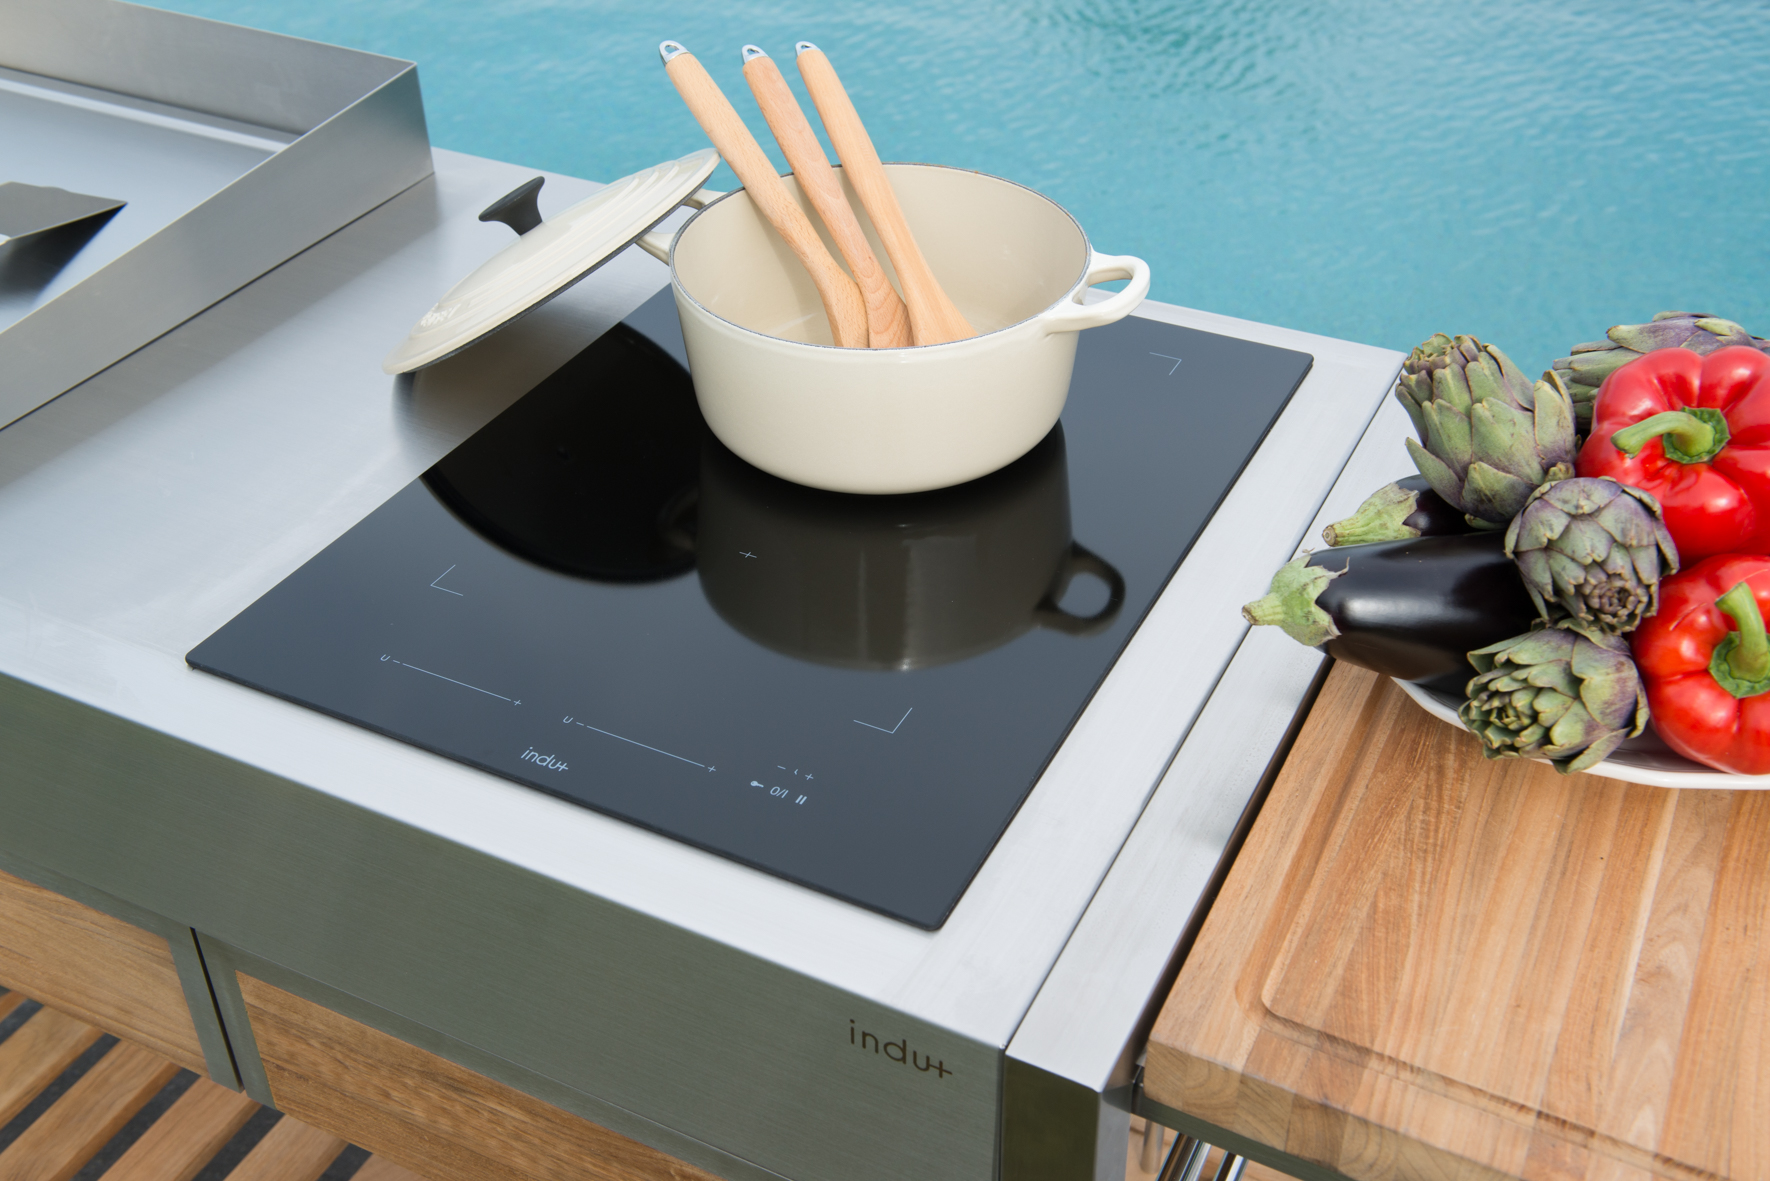 Outdoorküche Klappbar Preis : Outdoorküche serveboy ultimo outdoorküche grill bbq